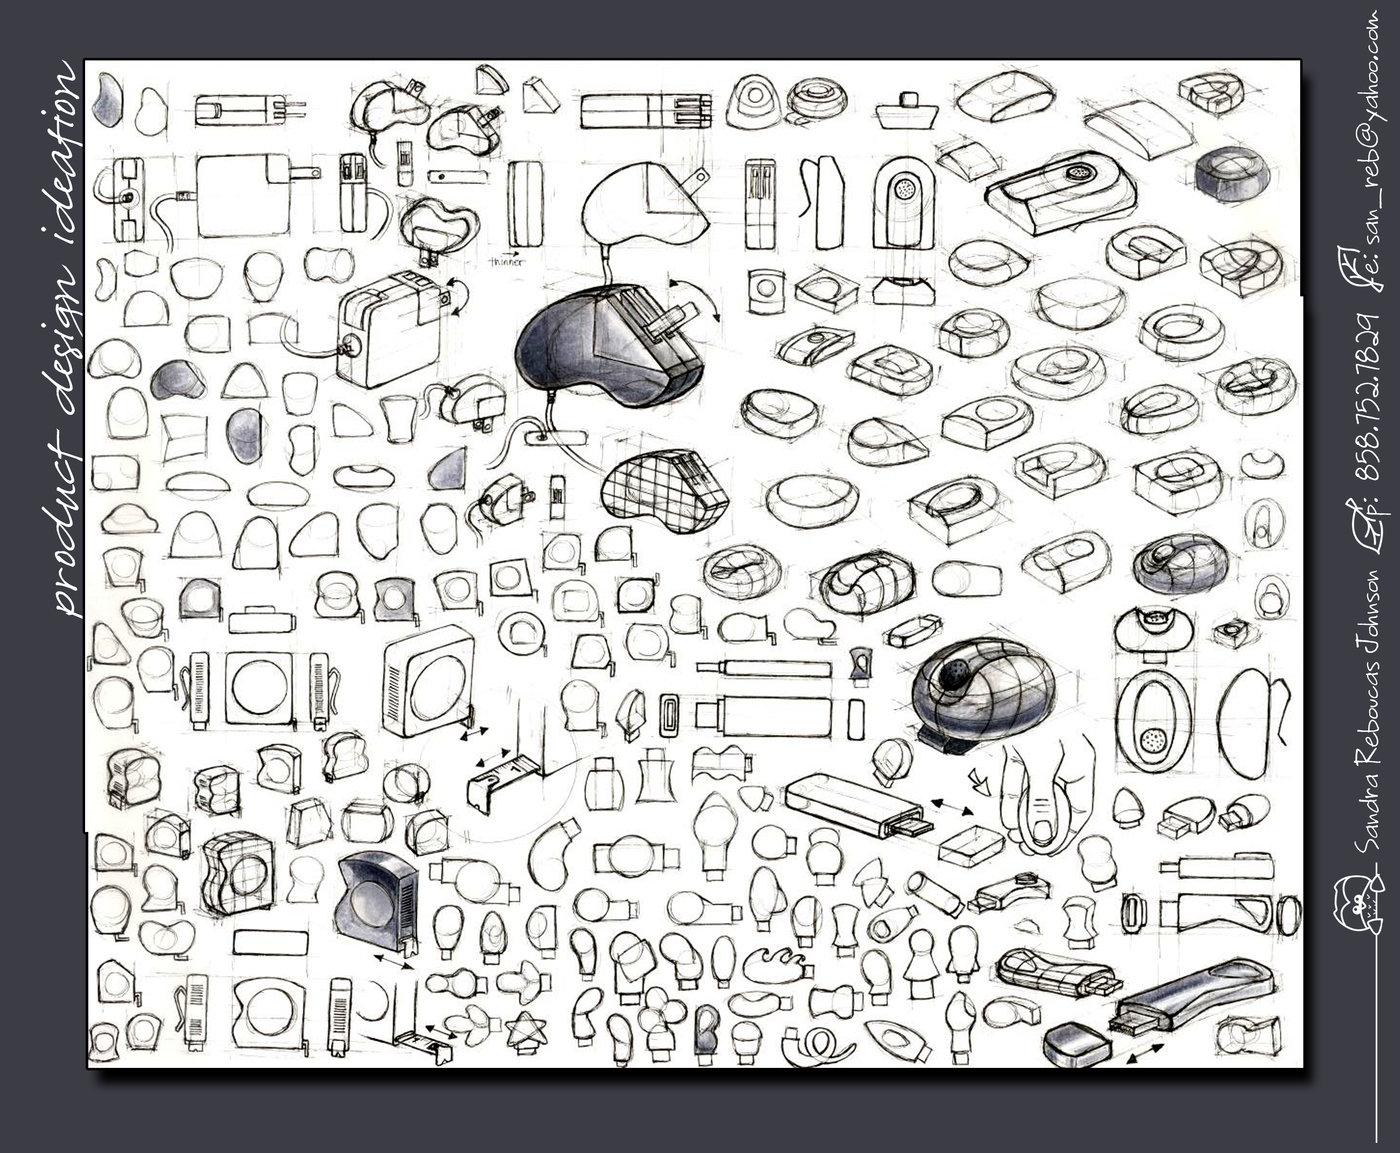 Product Ideation By Sandra Reboucas At Coroflot